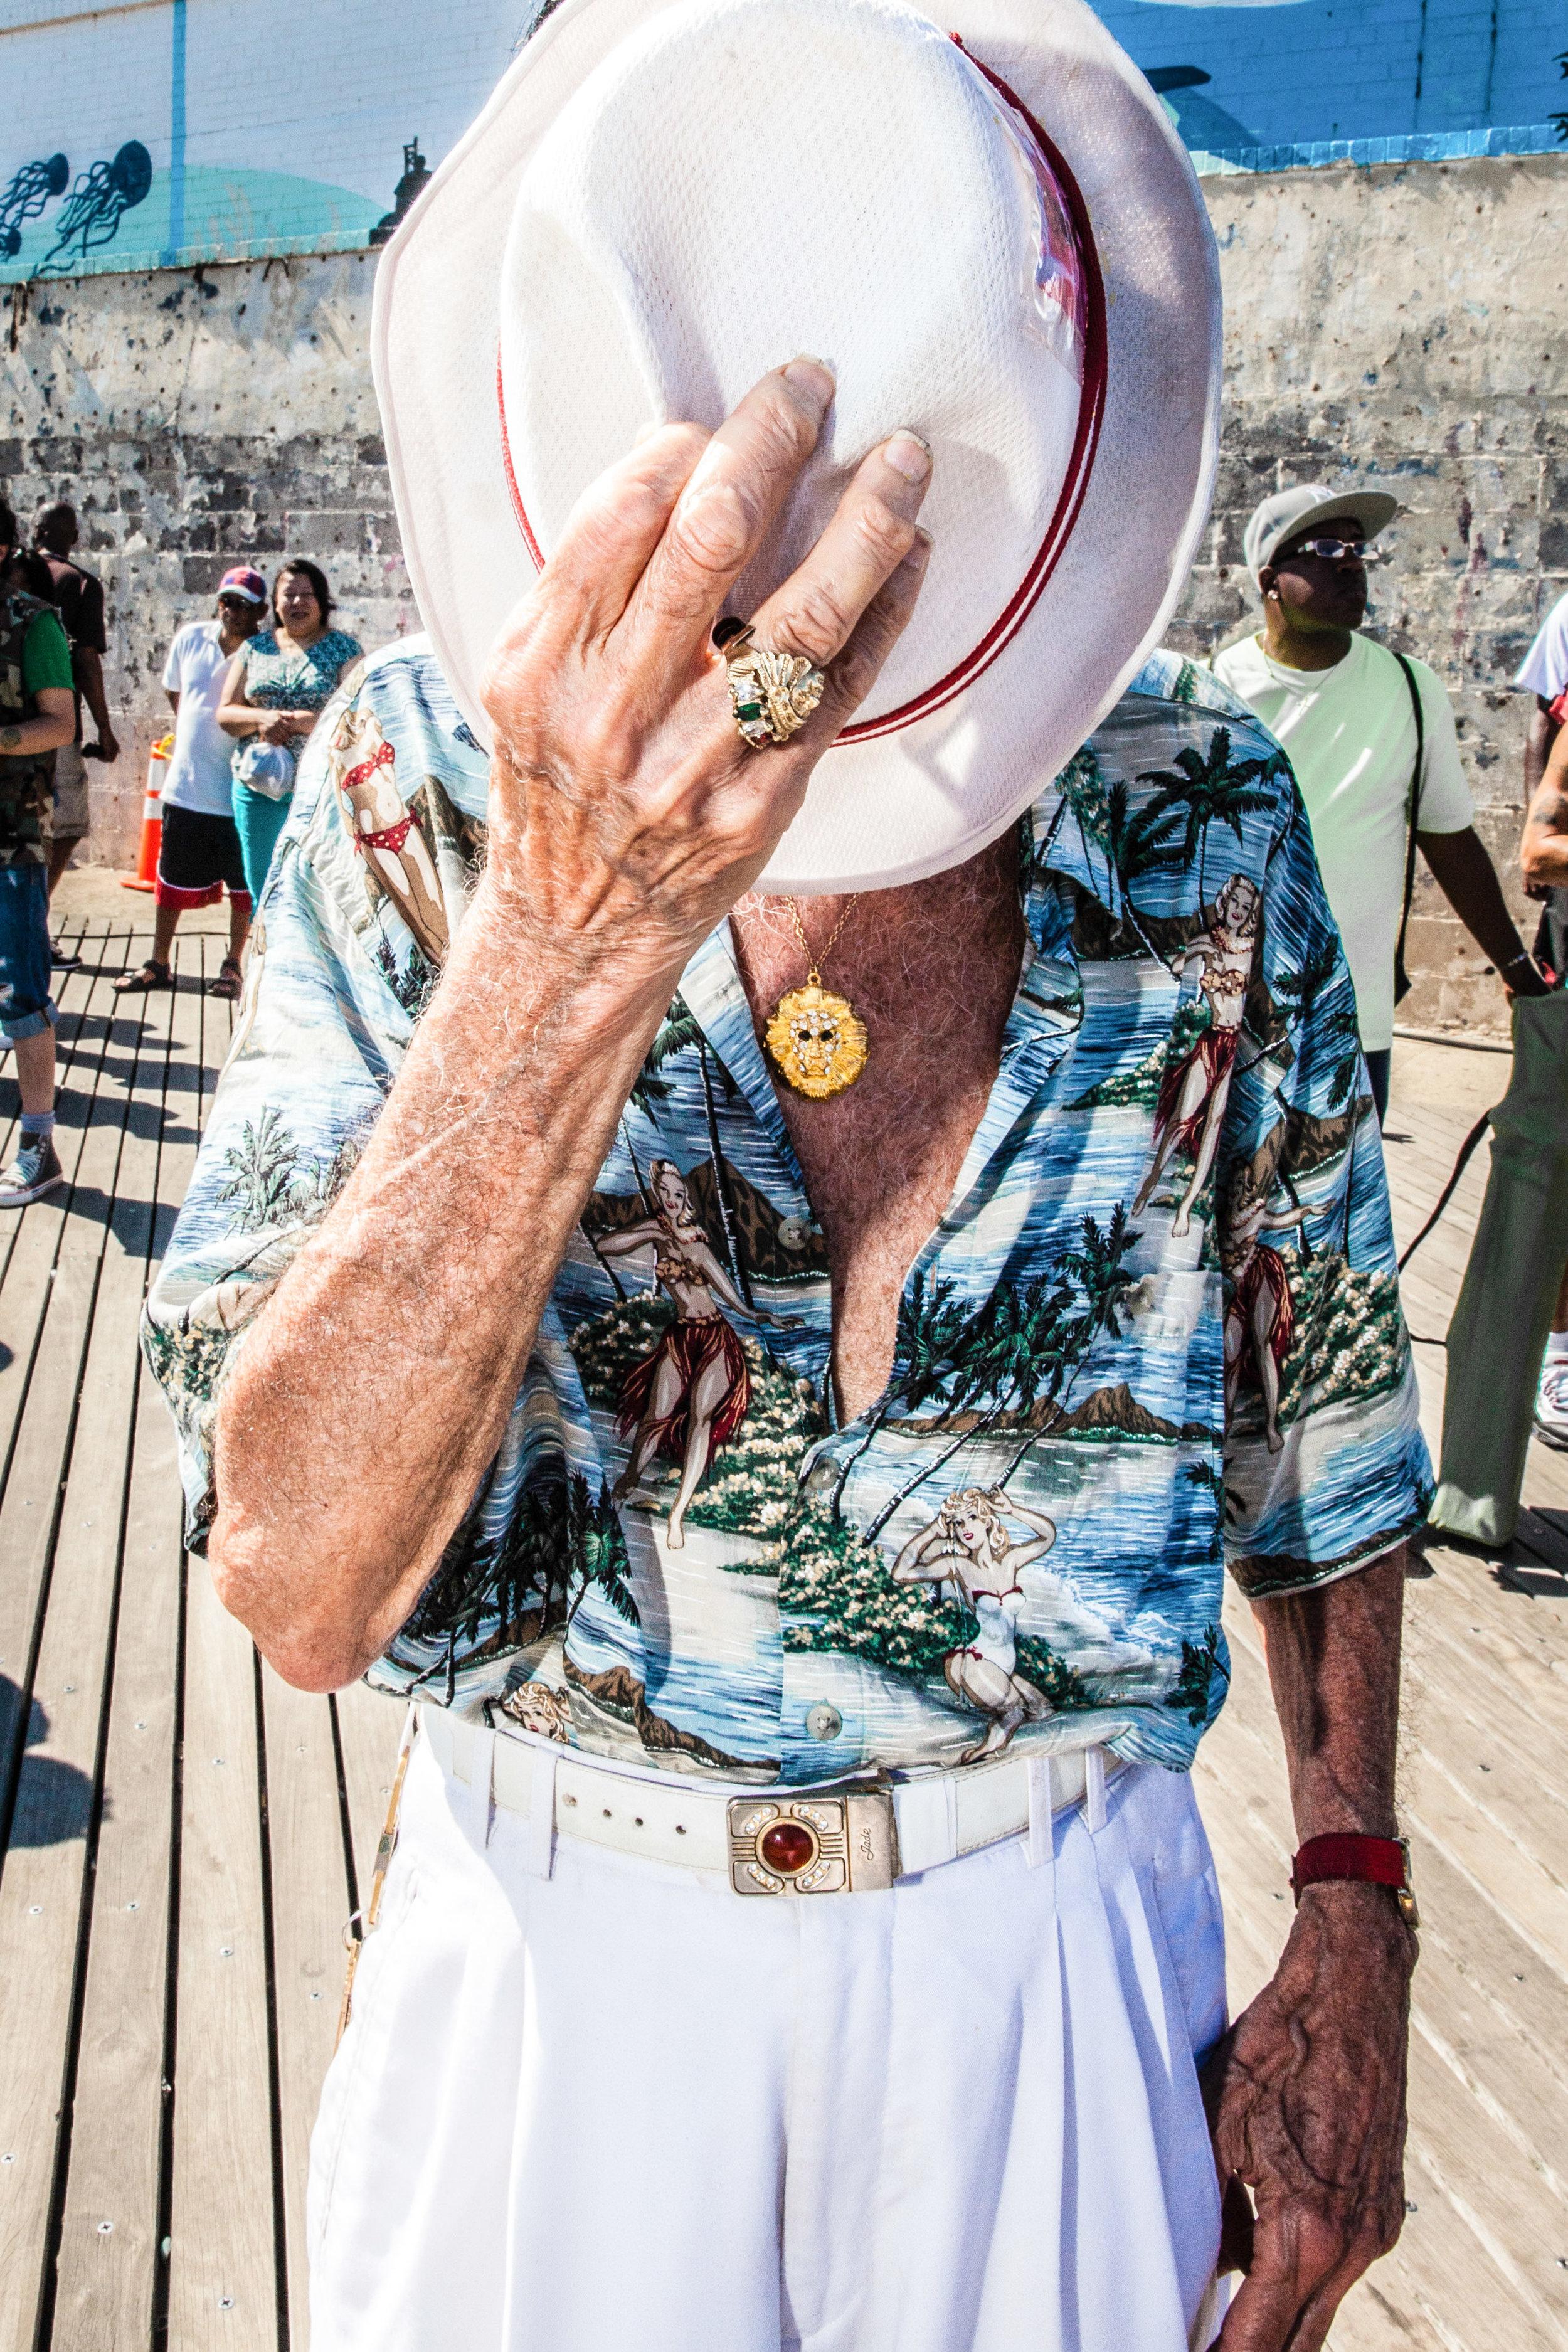 Copy of Lot 577 Beach Body Bingo - Disco Is Dead - Photograph